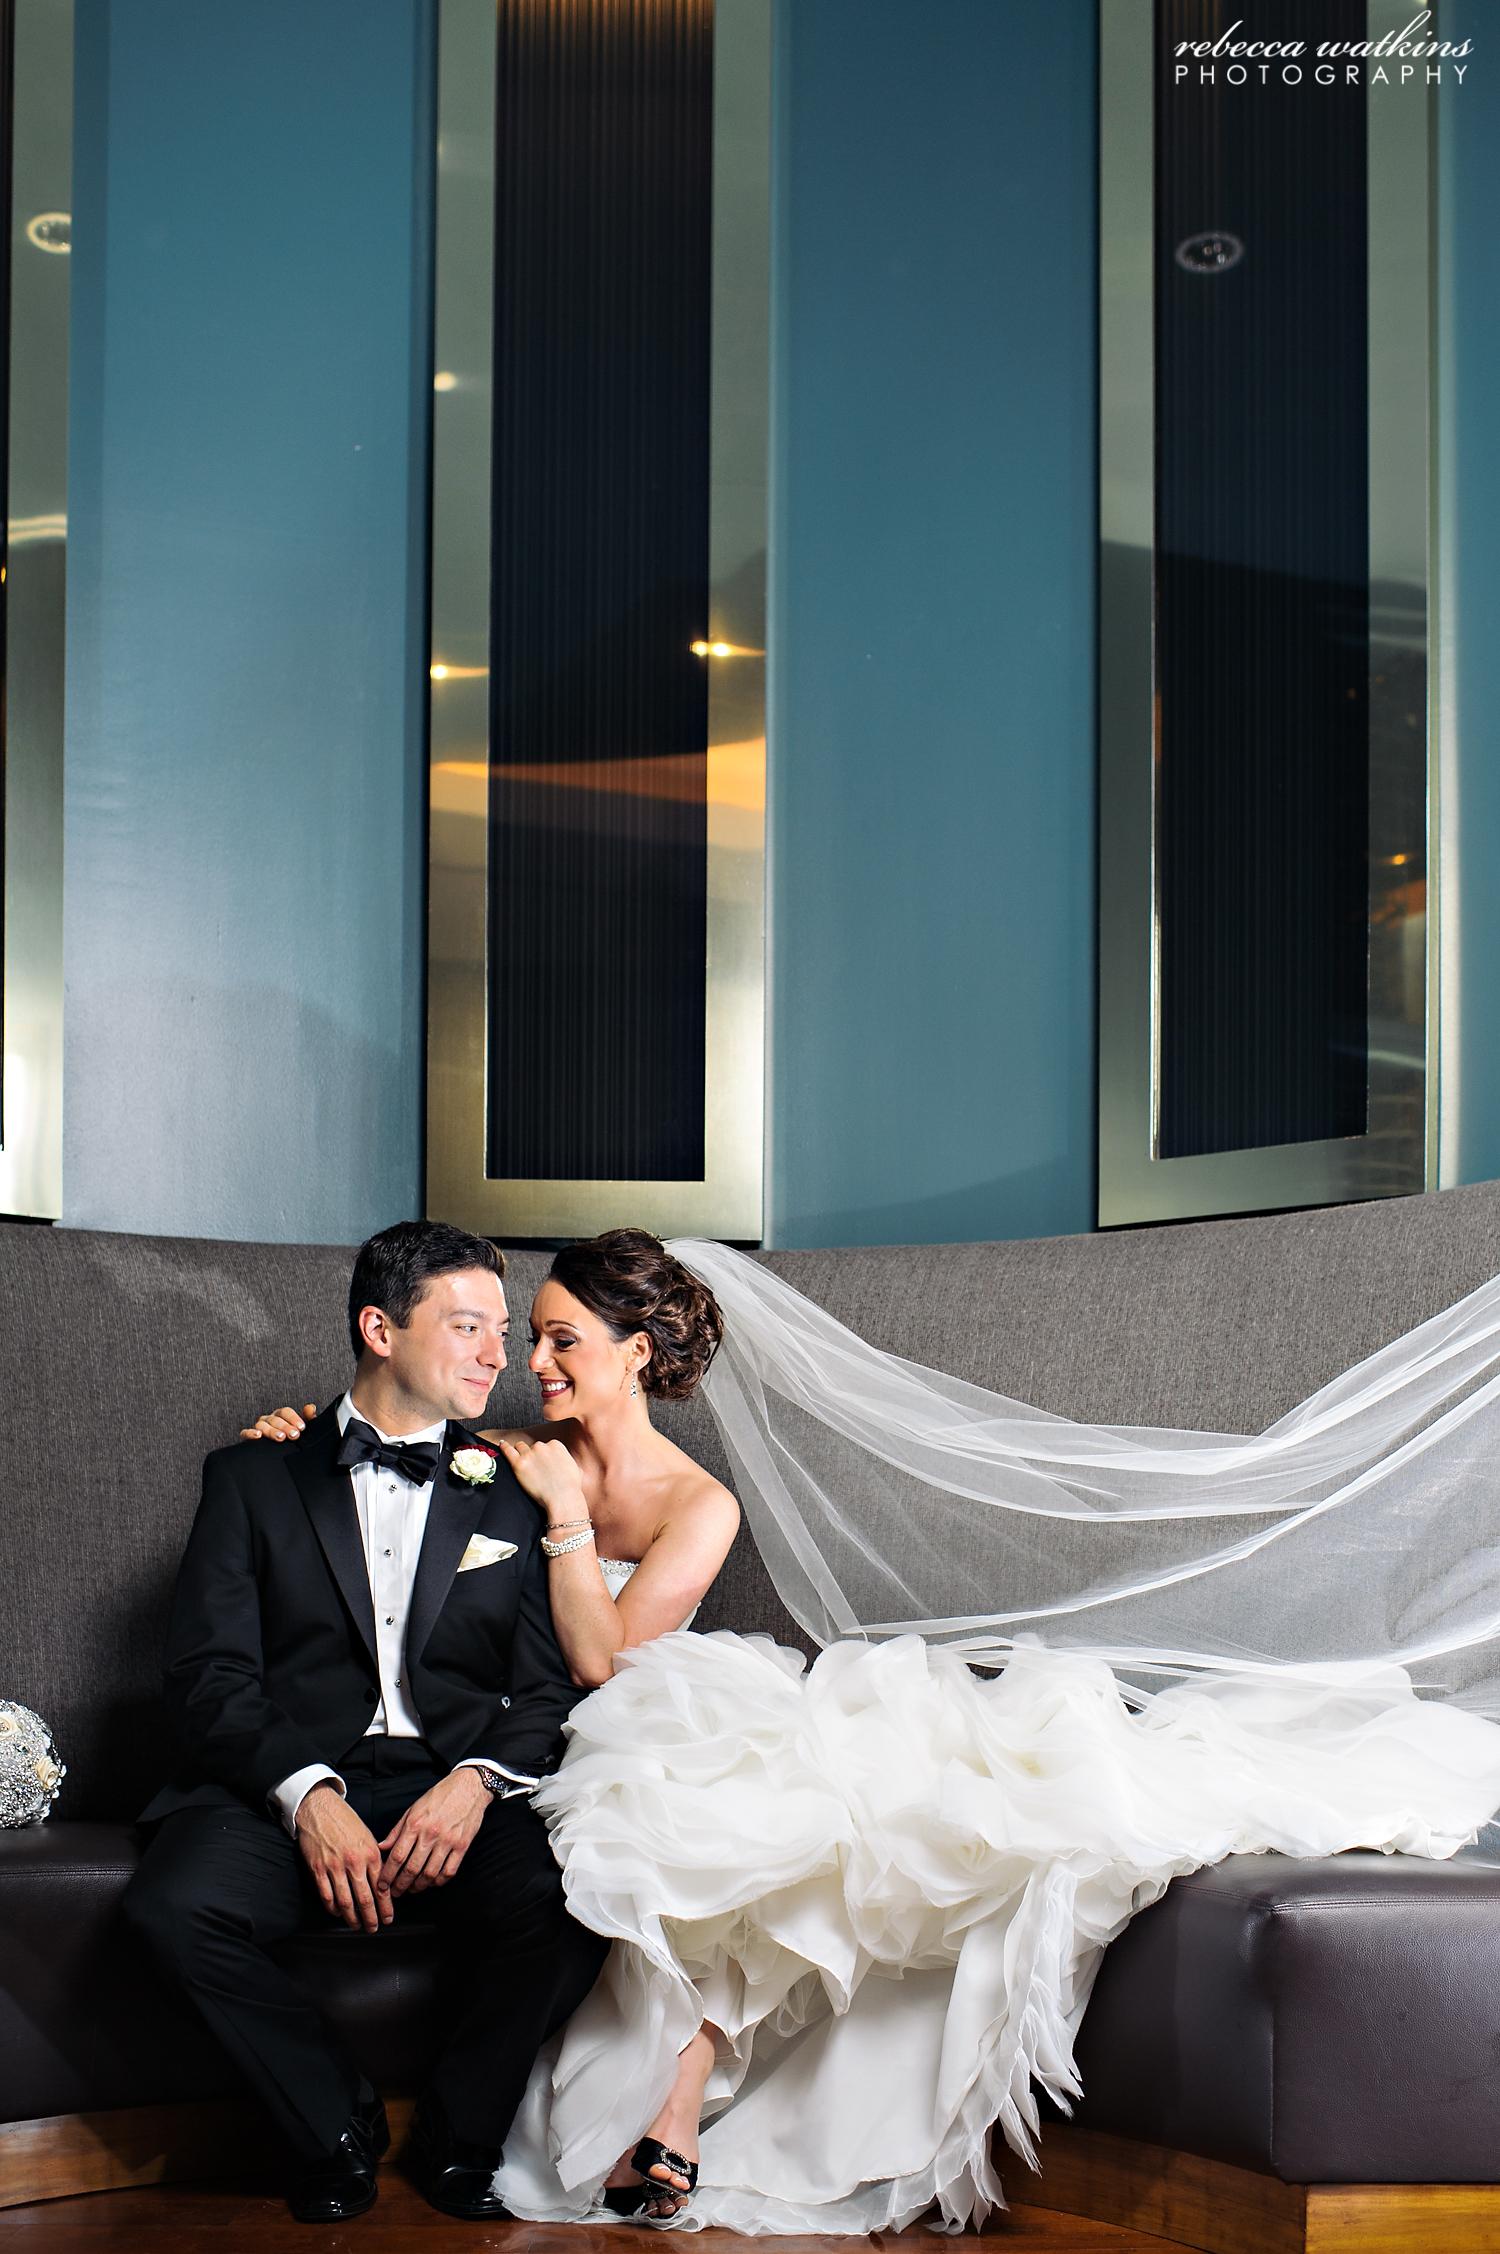 rebeccawatkinsphotographycarlylealexandriawedding-41.jpg